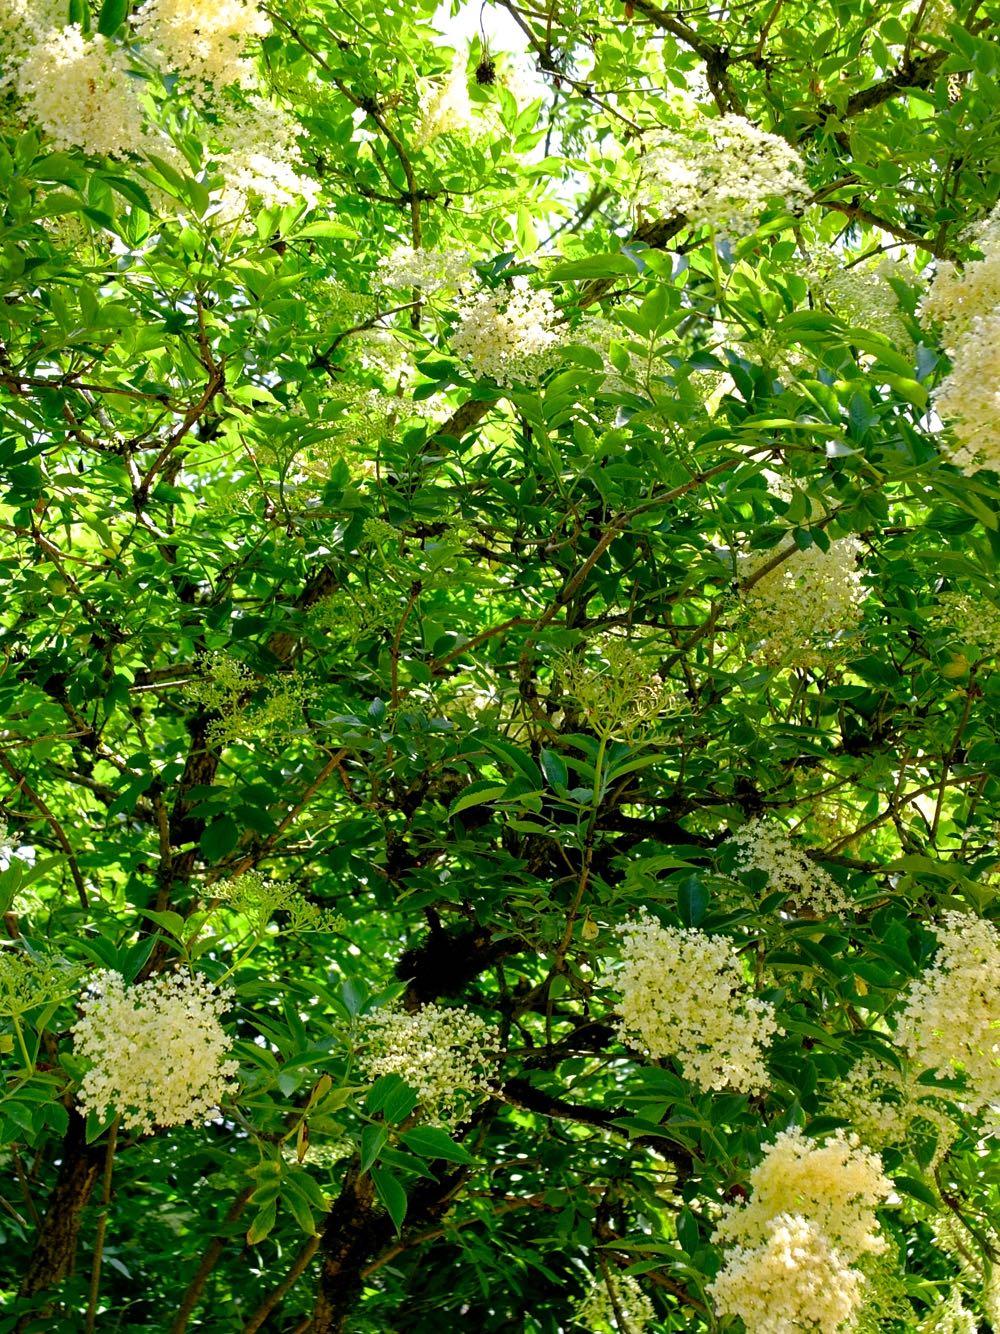 Sunlight shining through an elderflower bush.